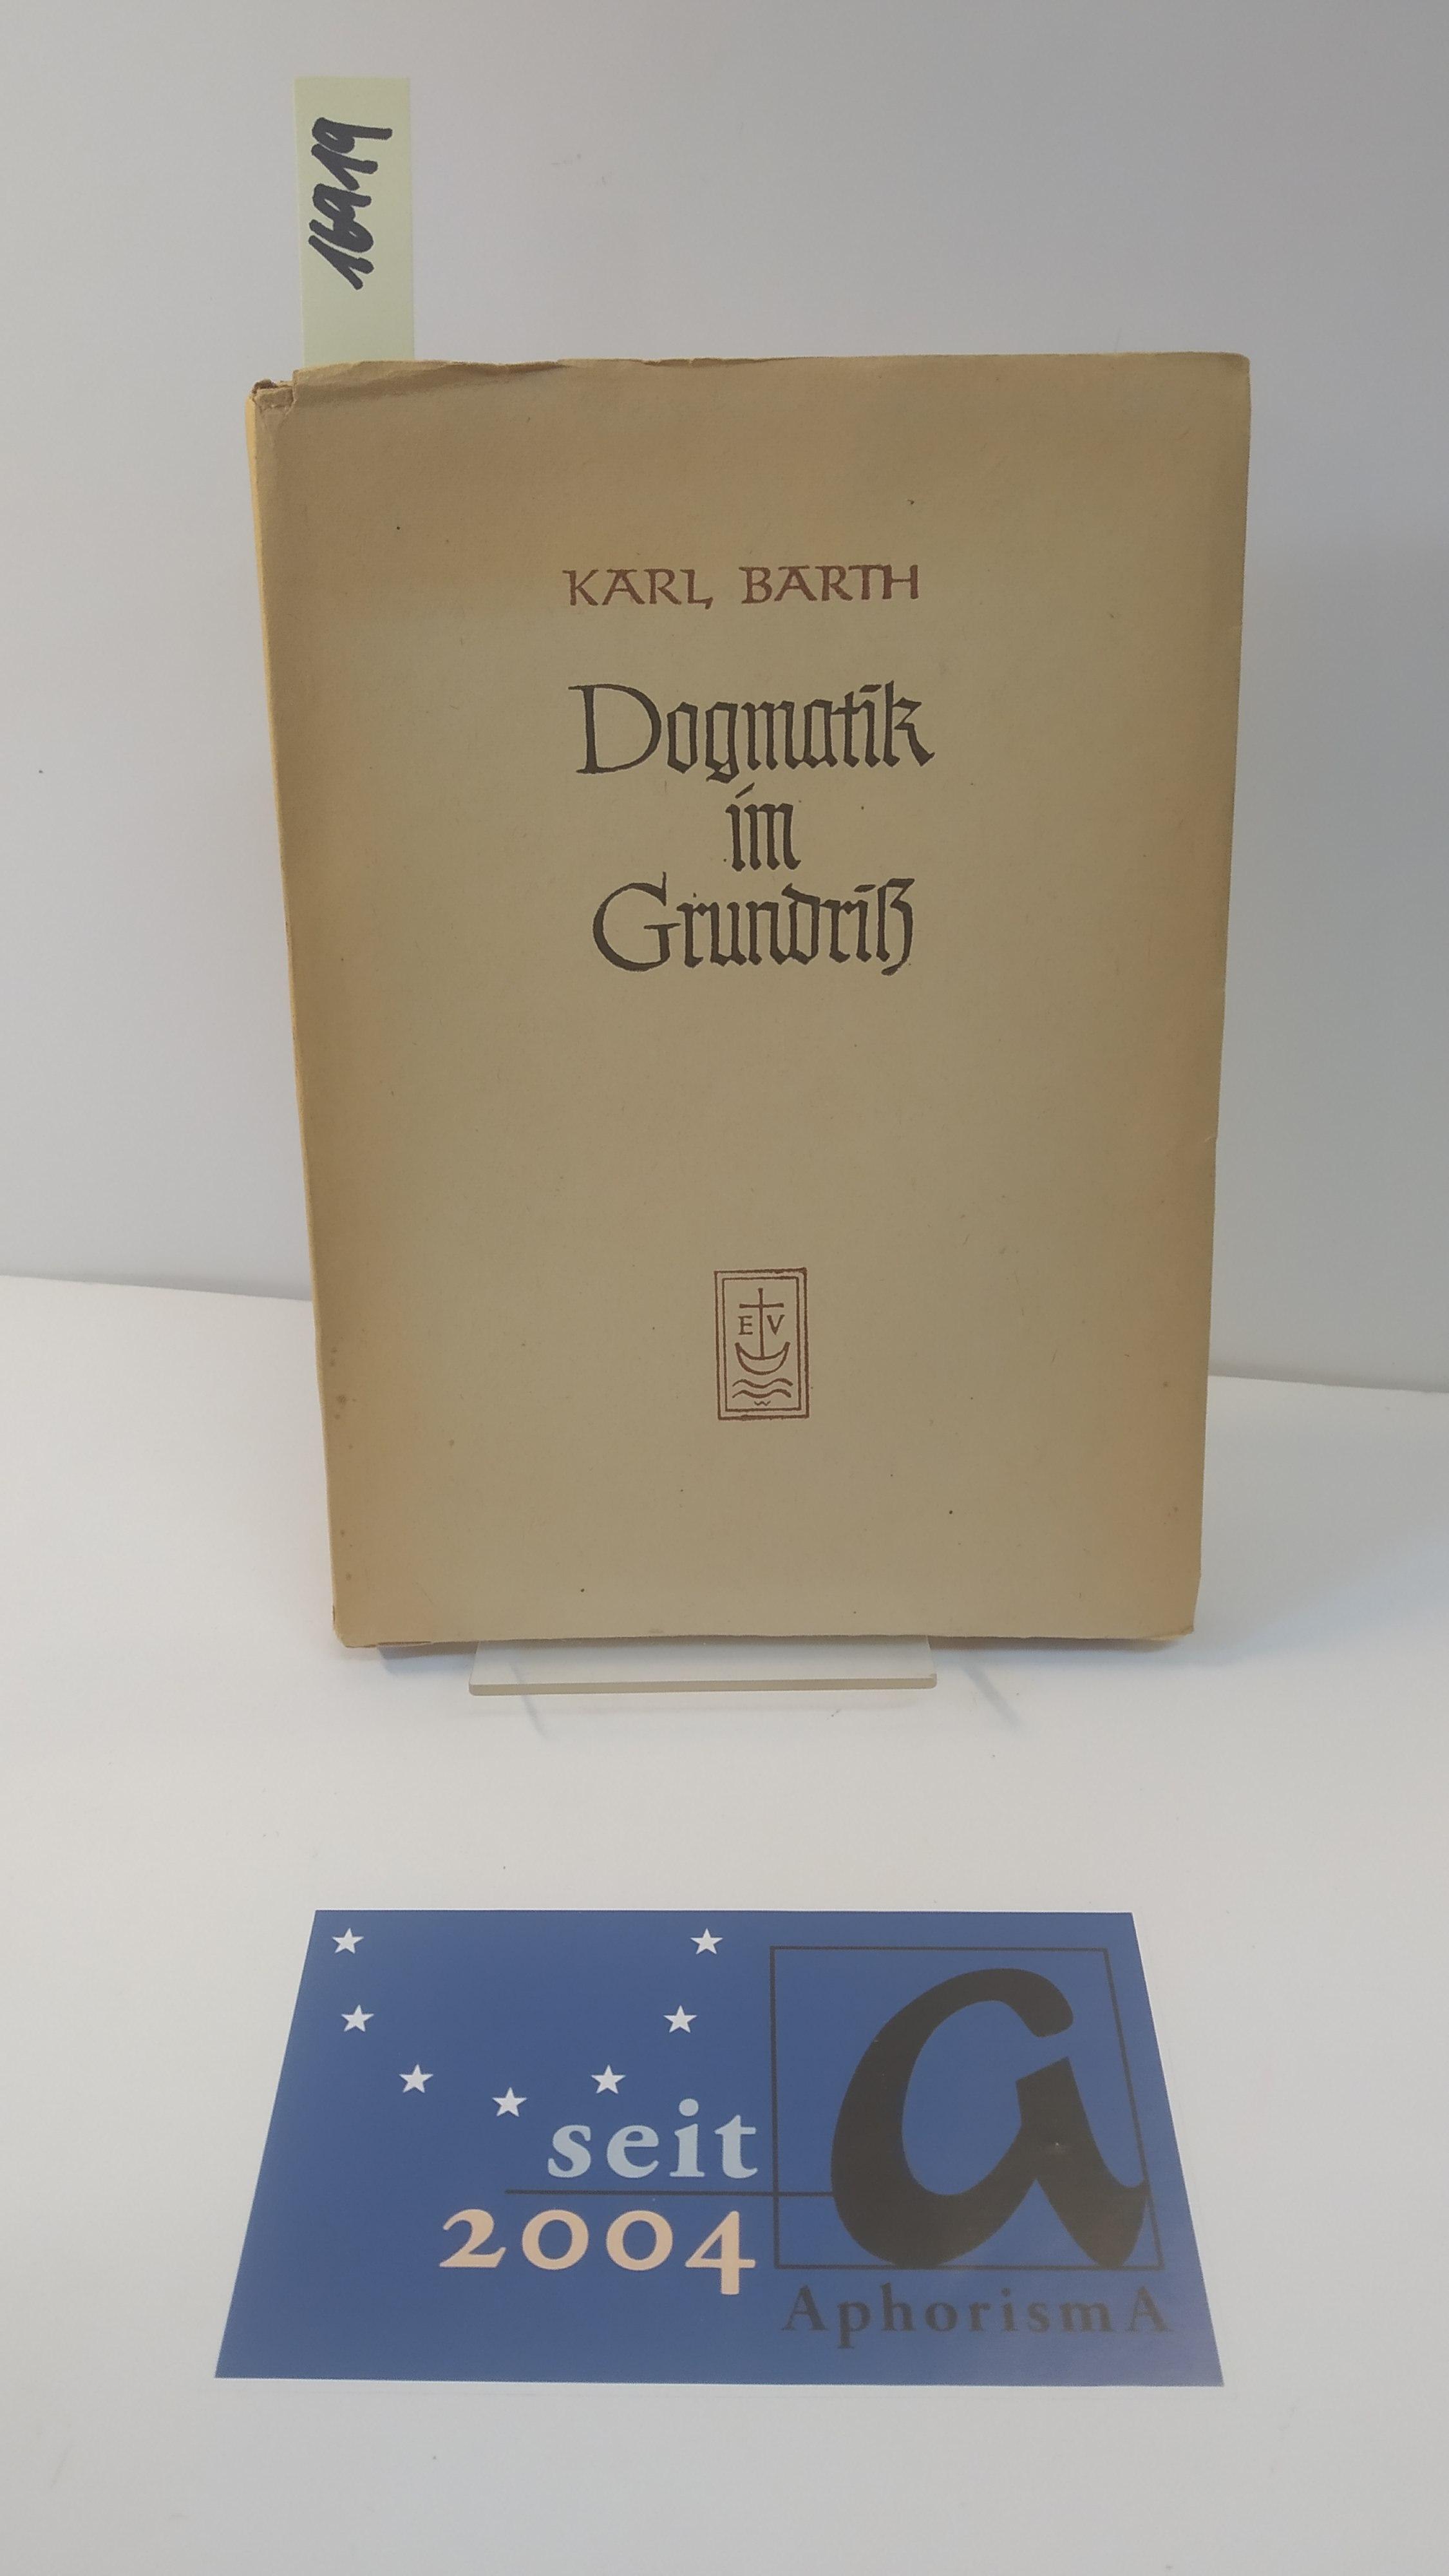 Dogmatik im Grundriß im Anschluß an das: Barth, Karl